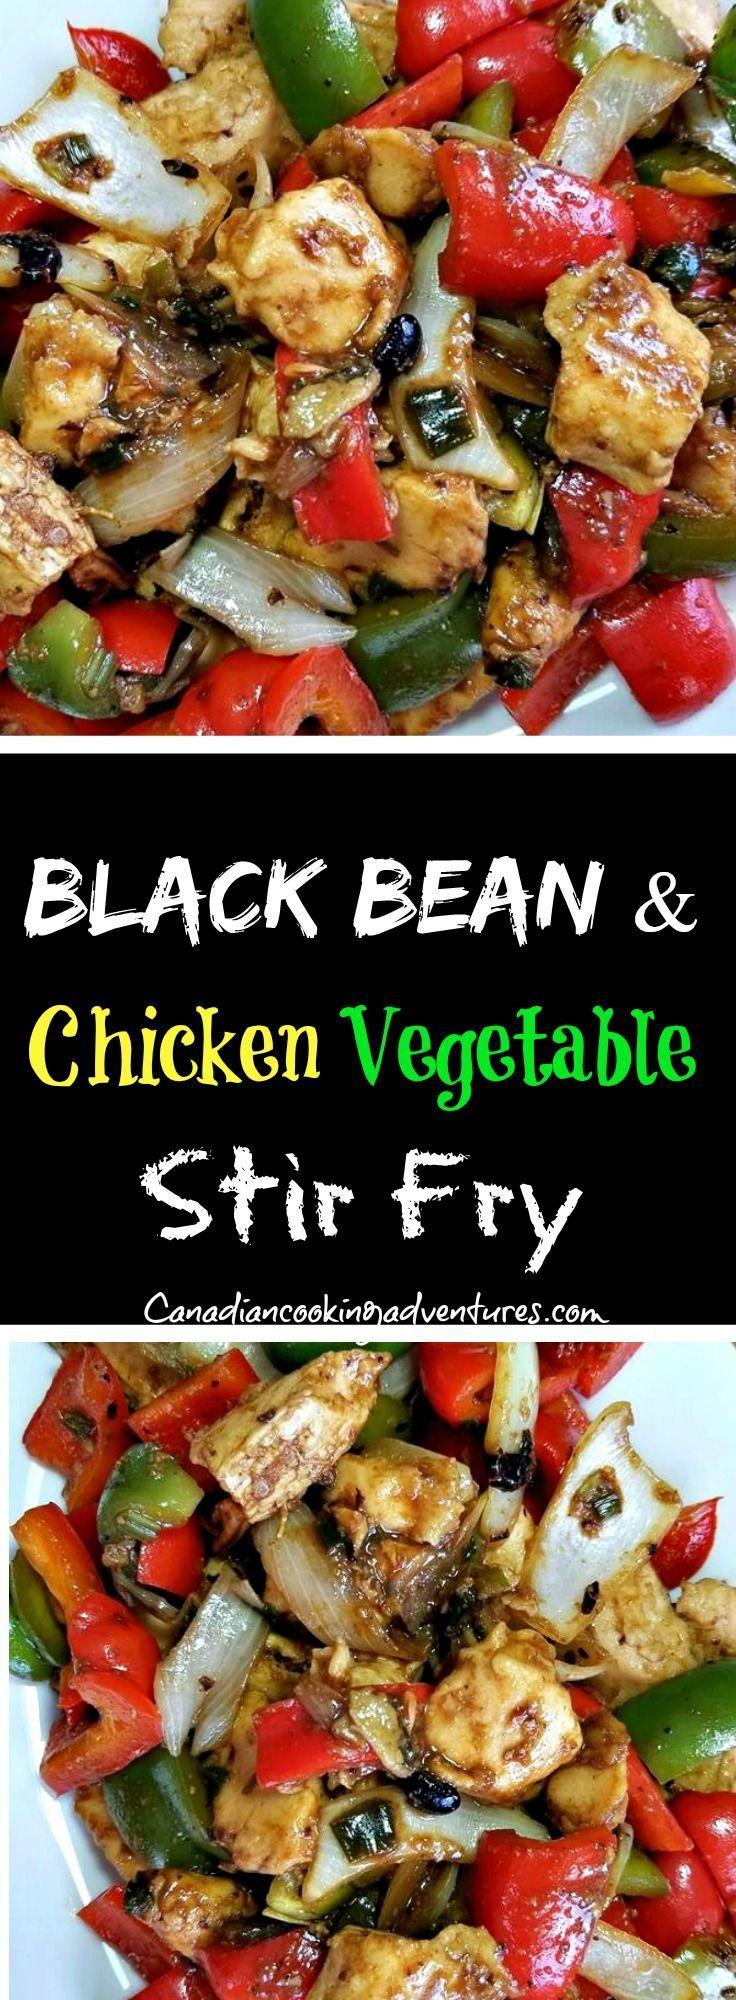 Black Bean & Chicken Vegetable Stir Fry